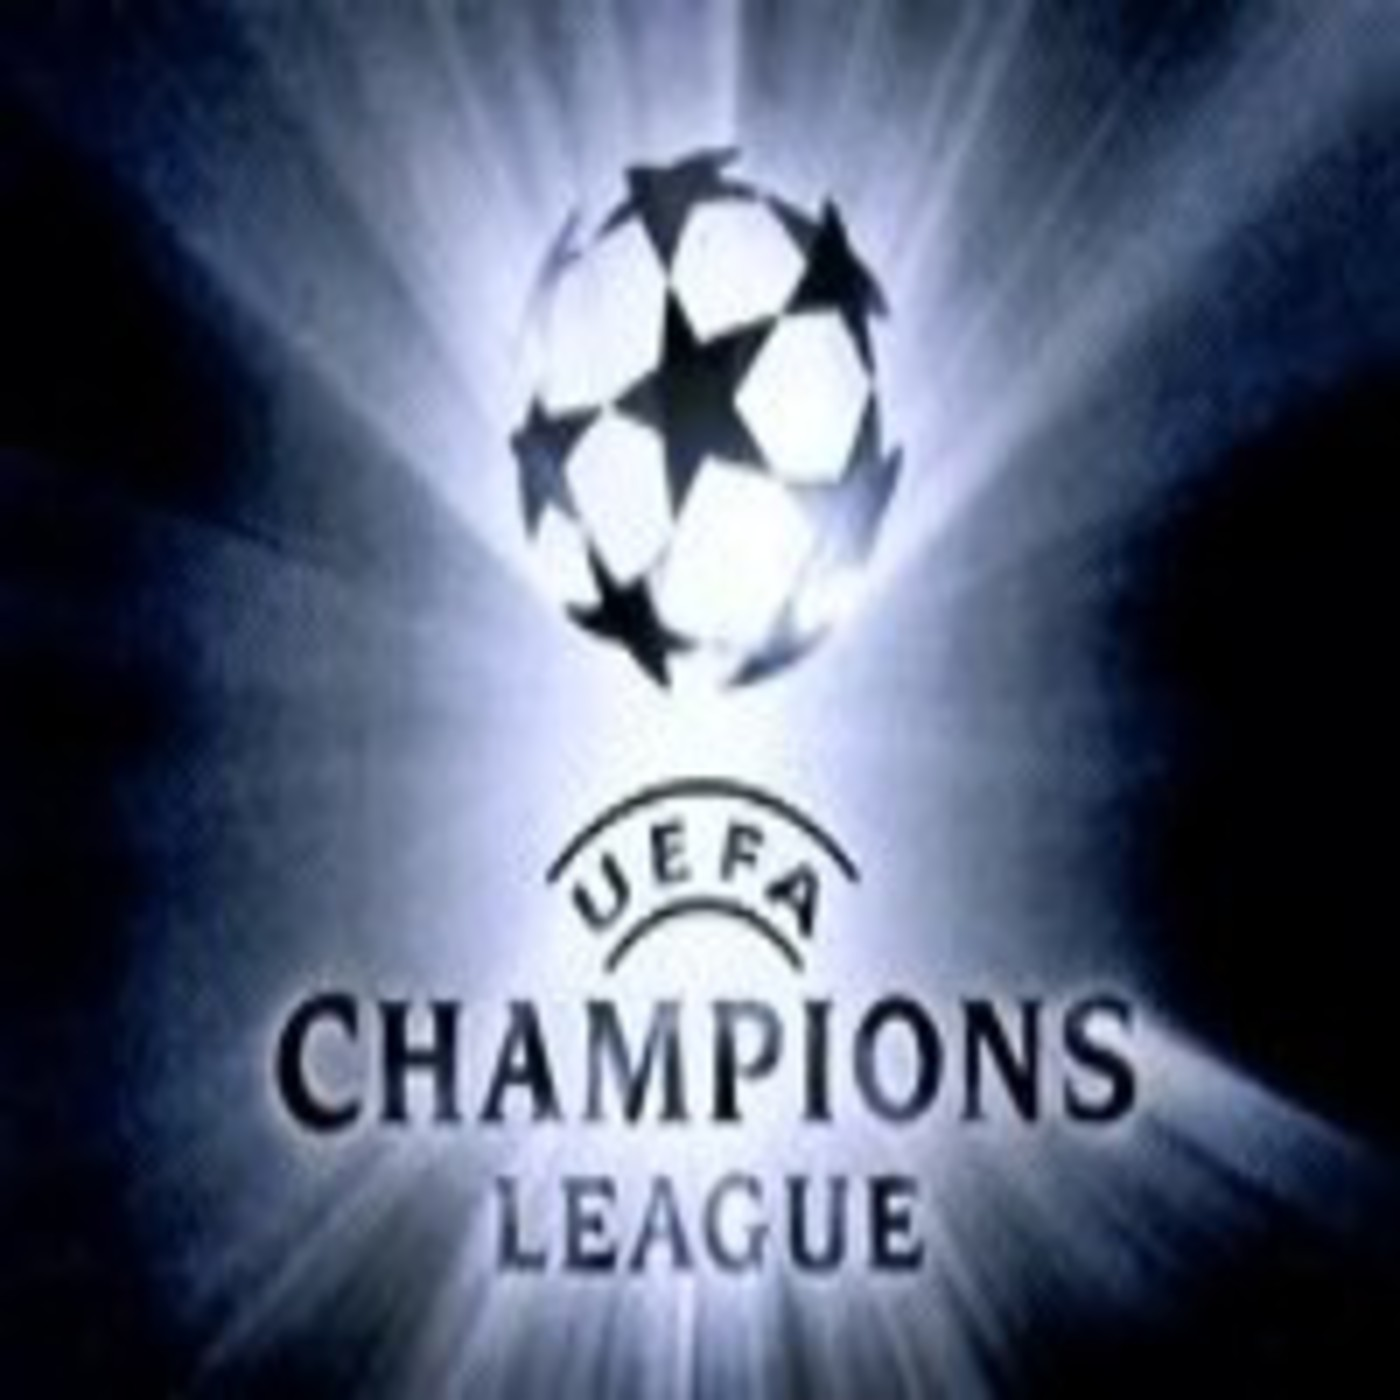 Champions League Mp3 Download: Himno Champions League: Música Para Campeones En 100